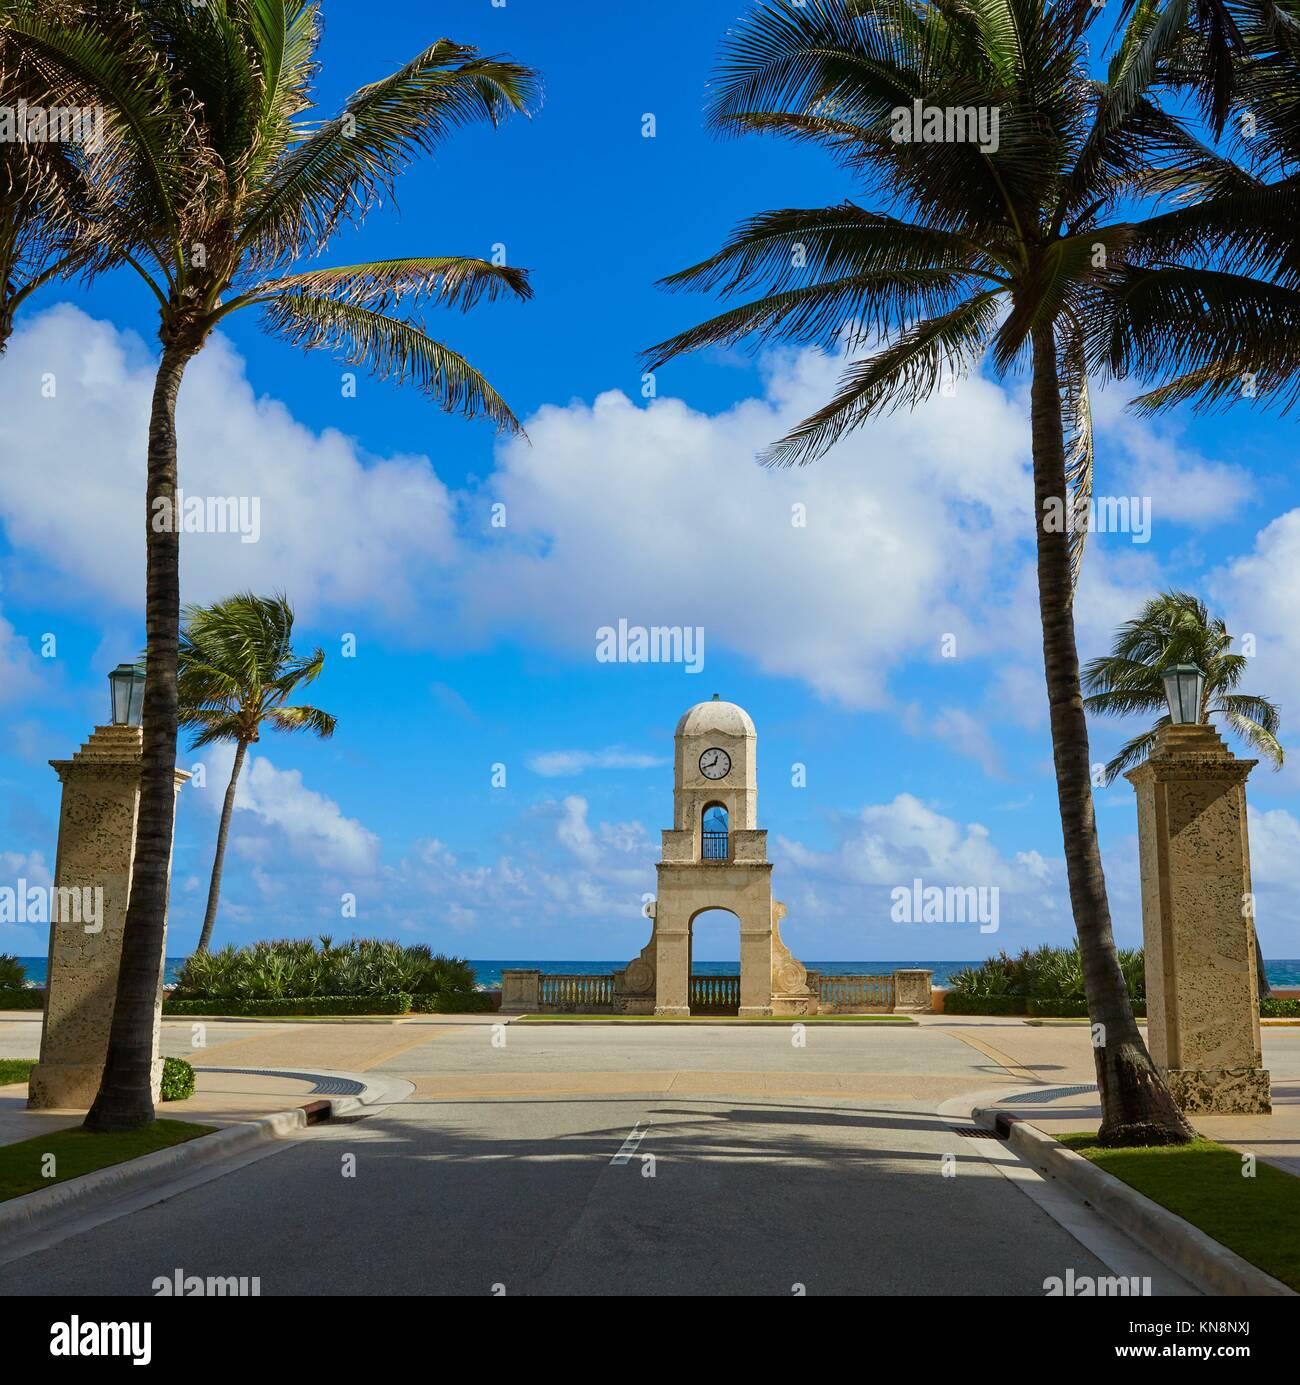 Palm Beach Worth Avenue clock tower Florida USA. Stock Photo